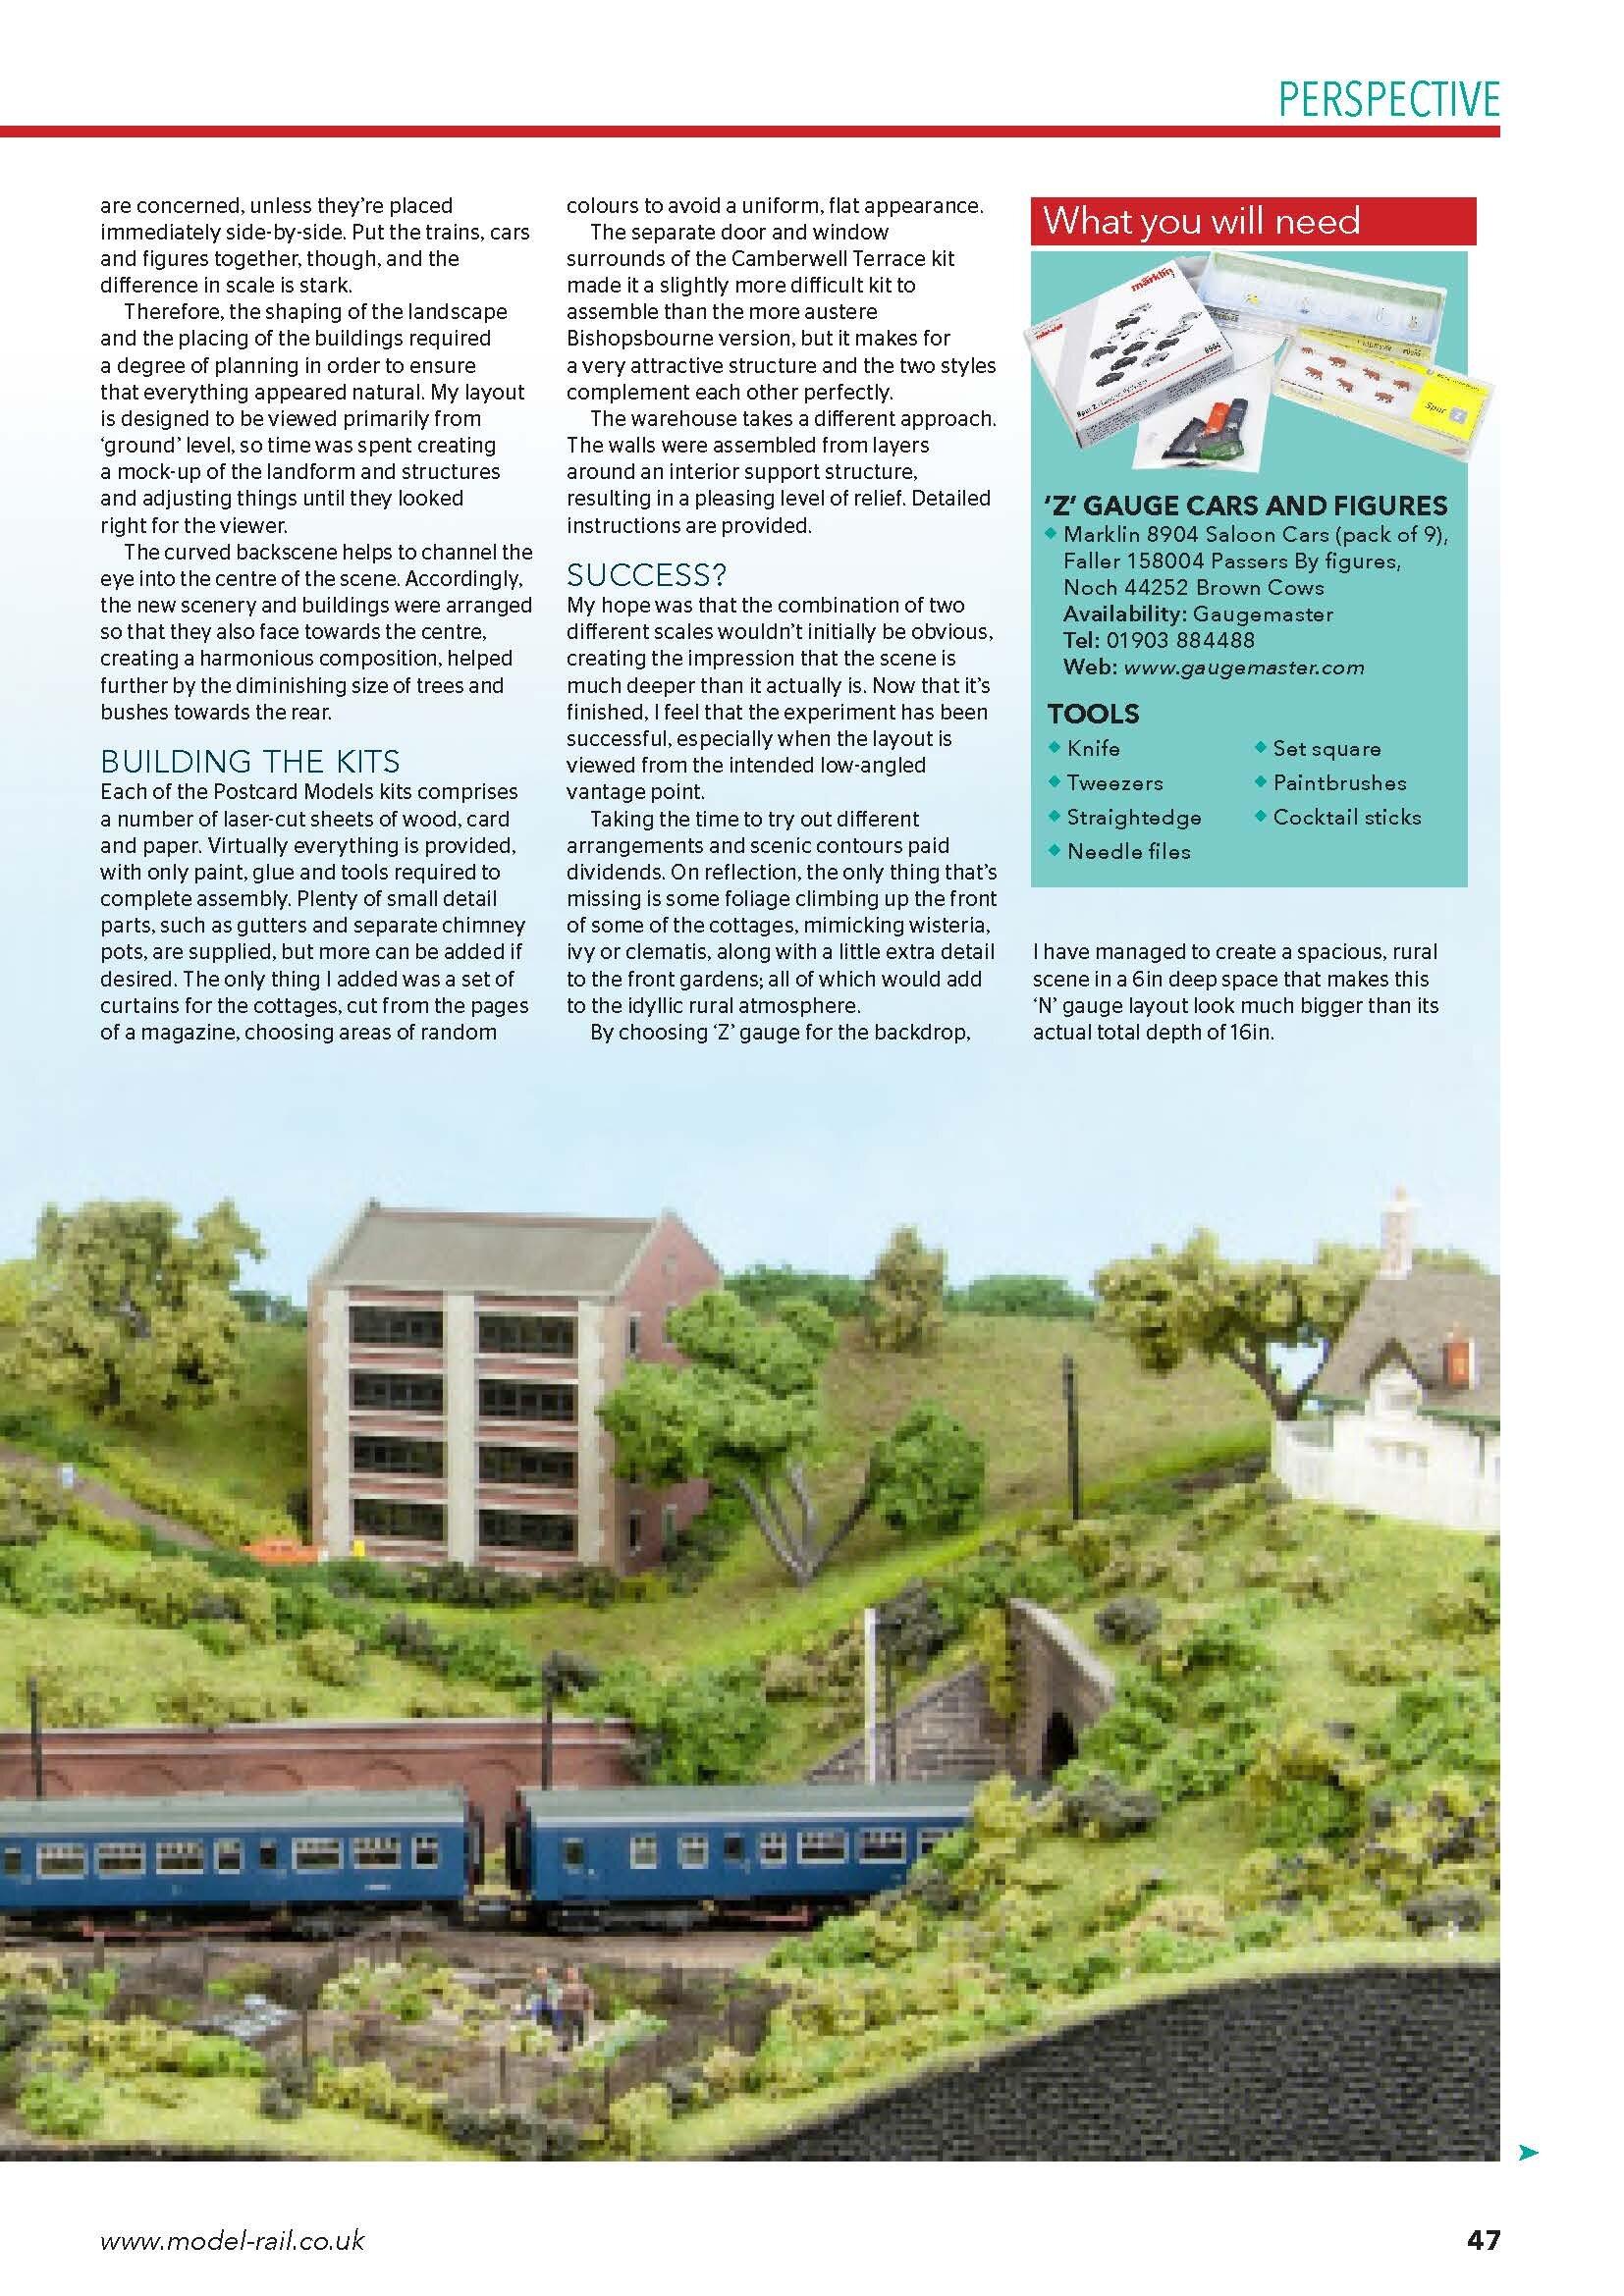 MR265 Postcard Models_Page_2.jpg